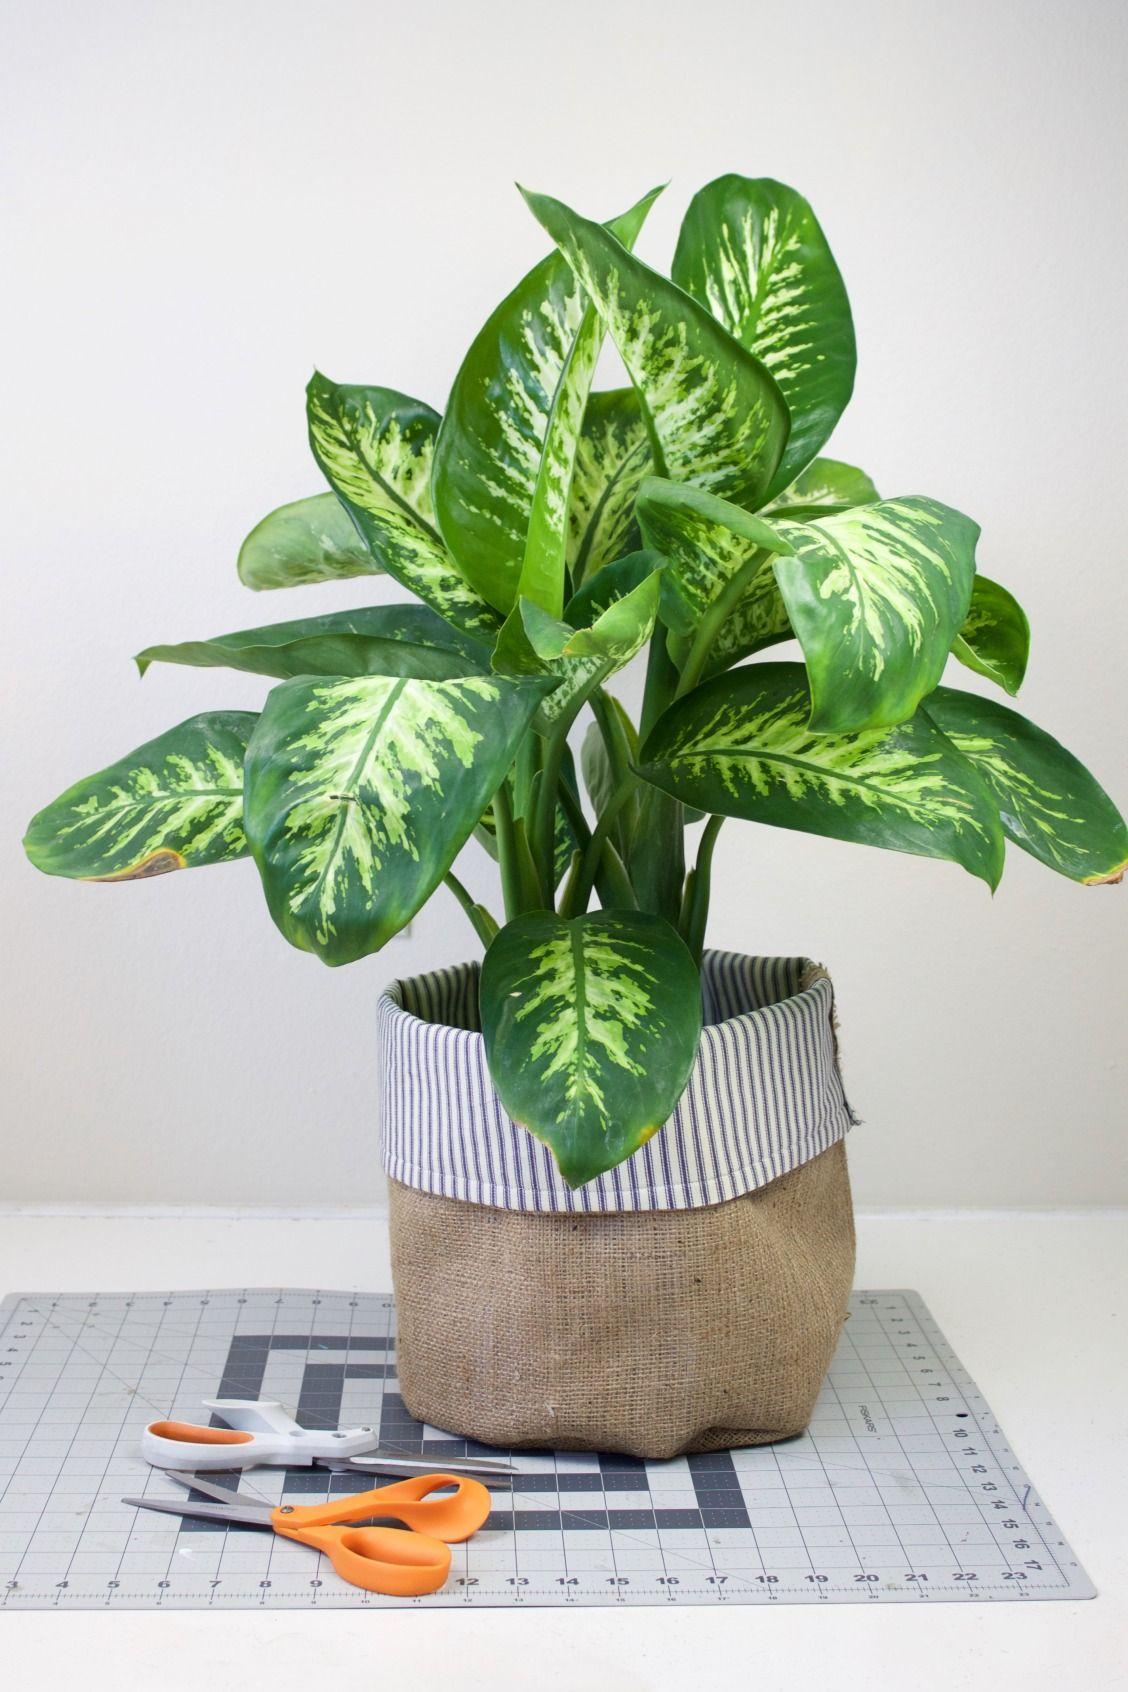 Diy Fabric Planters How To Decorate Flower Pots Fiskars Plant Pot Diy Diy Planters Indoor Flower Pots